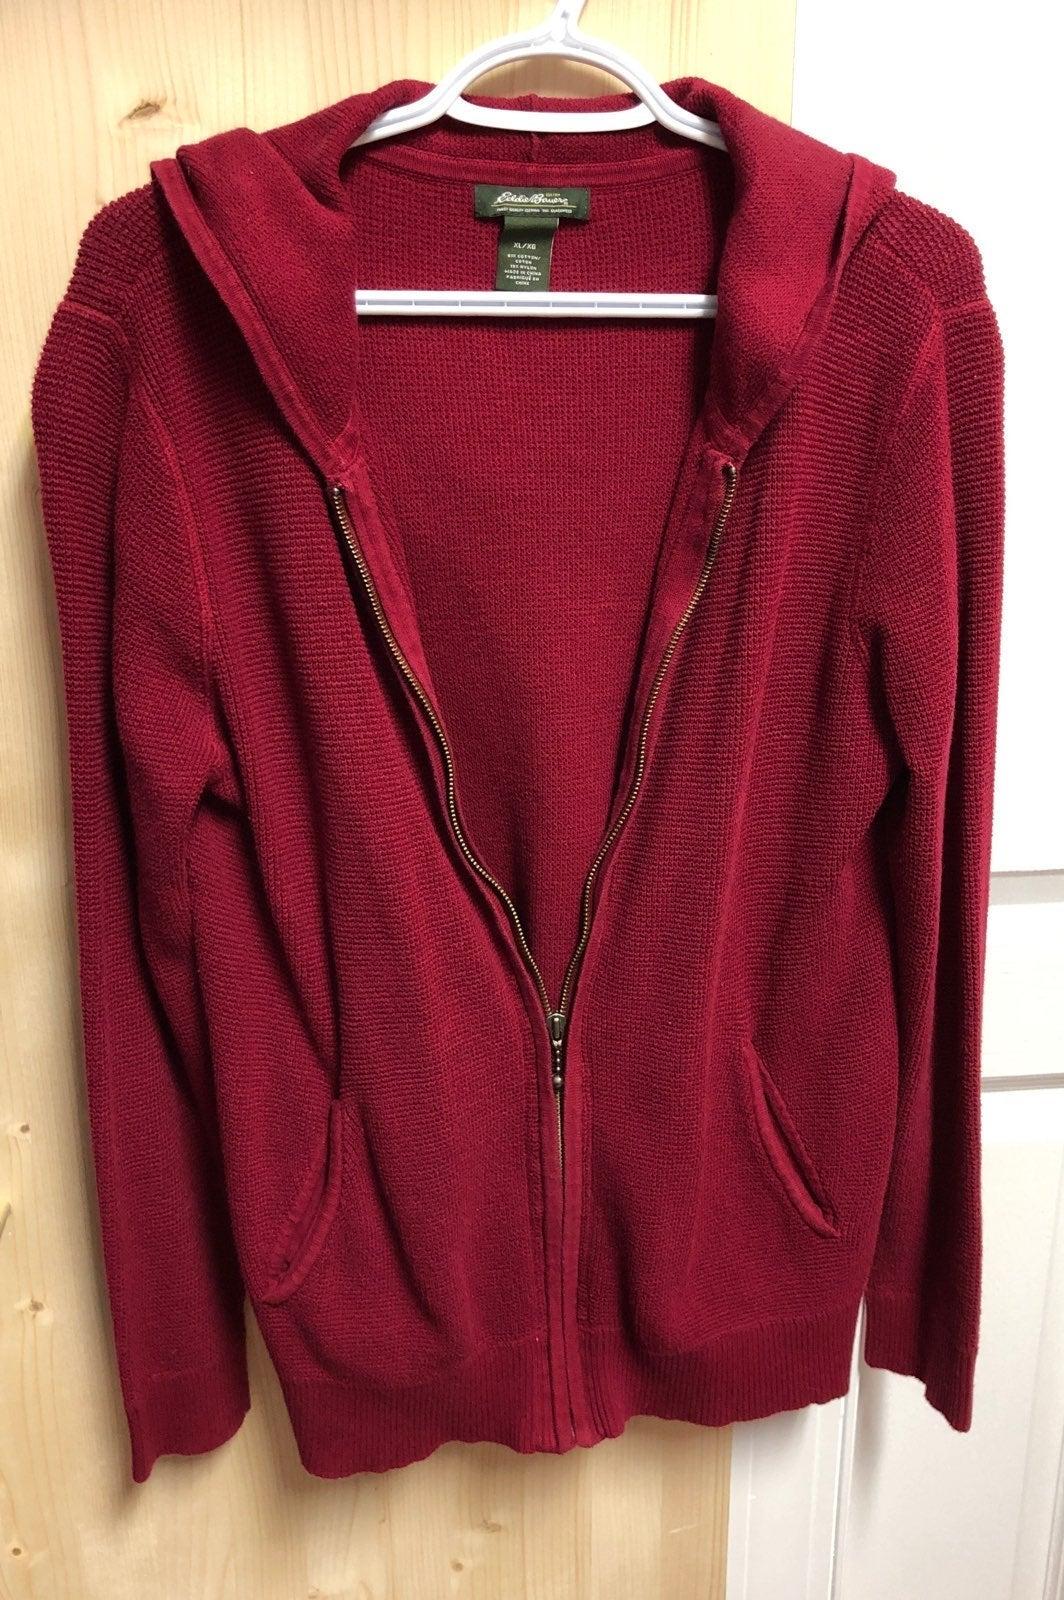 Womens zipper sweater/cardigan